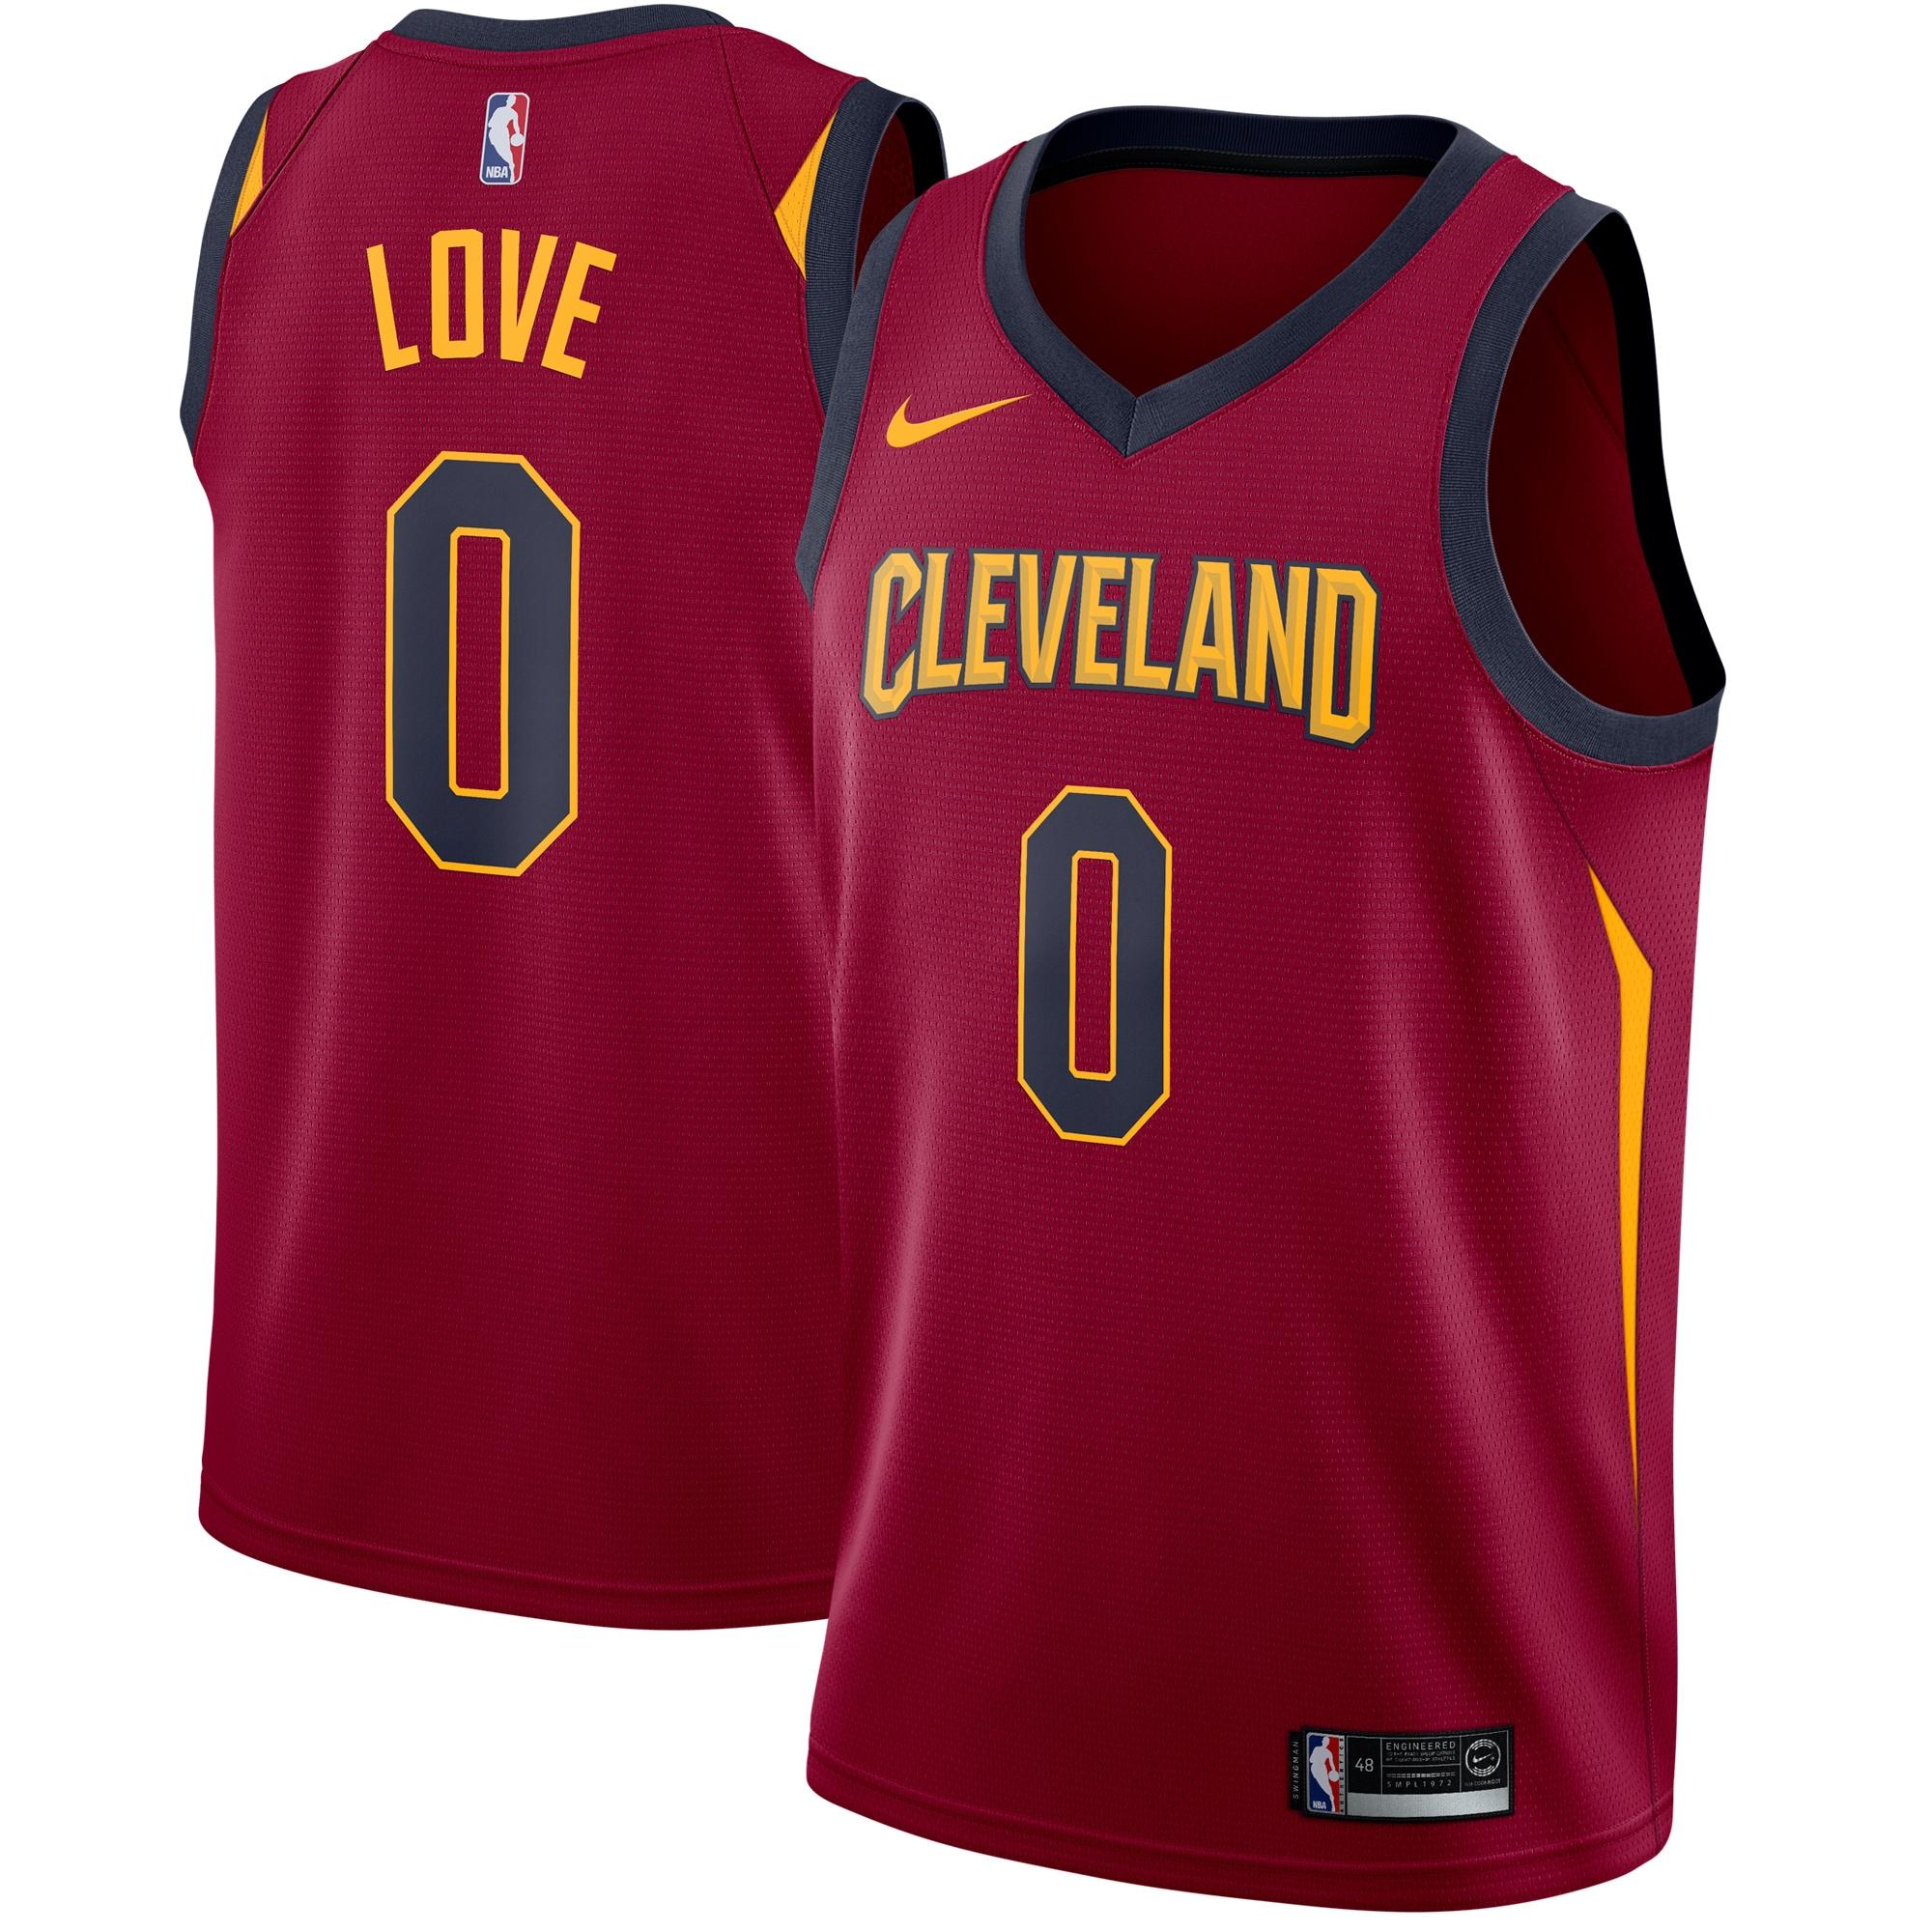 Kevin Love Cleveland Cavaliers Nike Swingman Jersey Maroon - Icon Edition